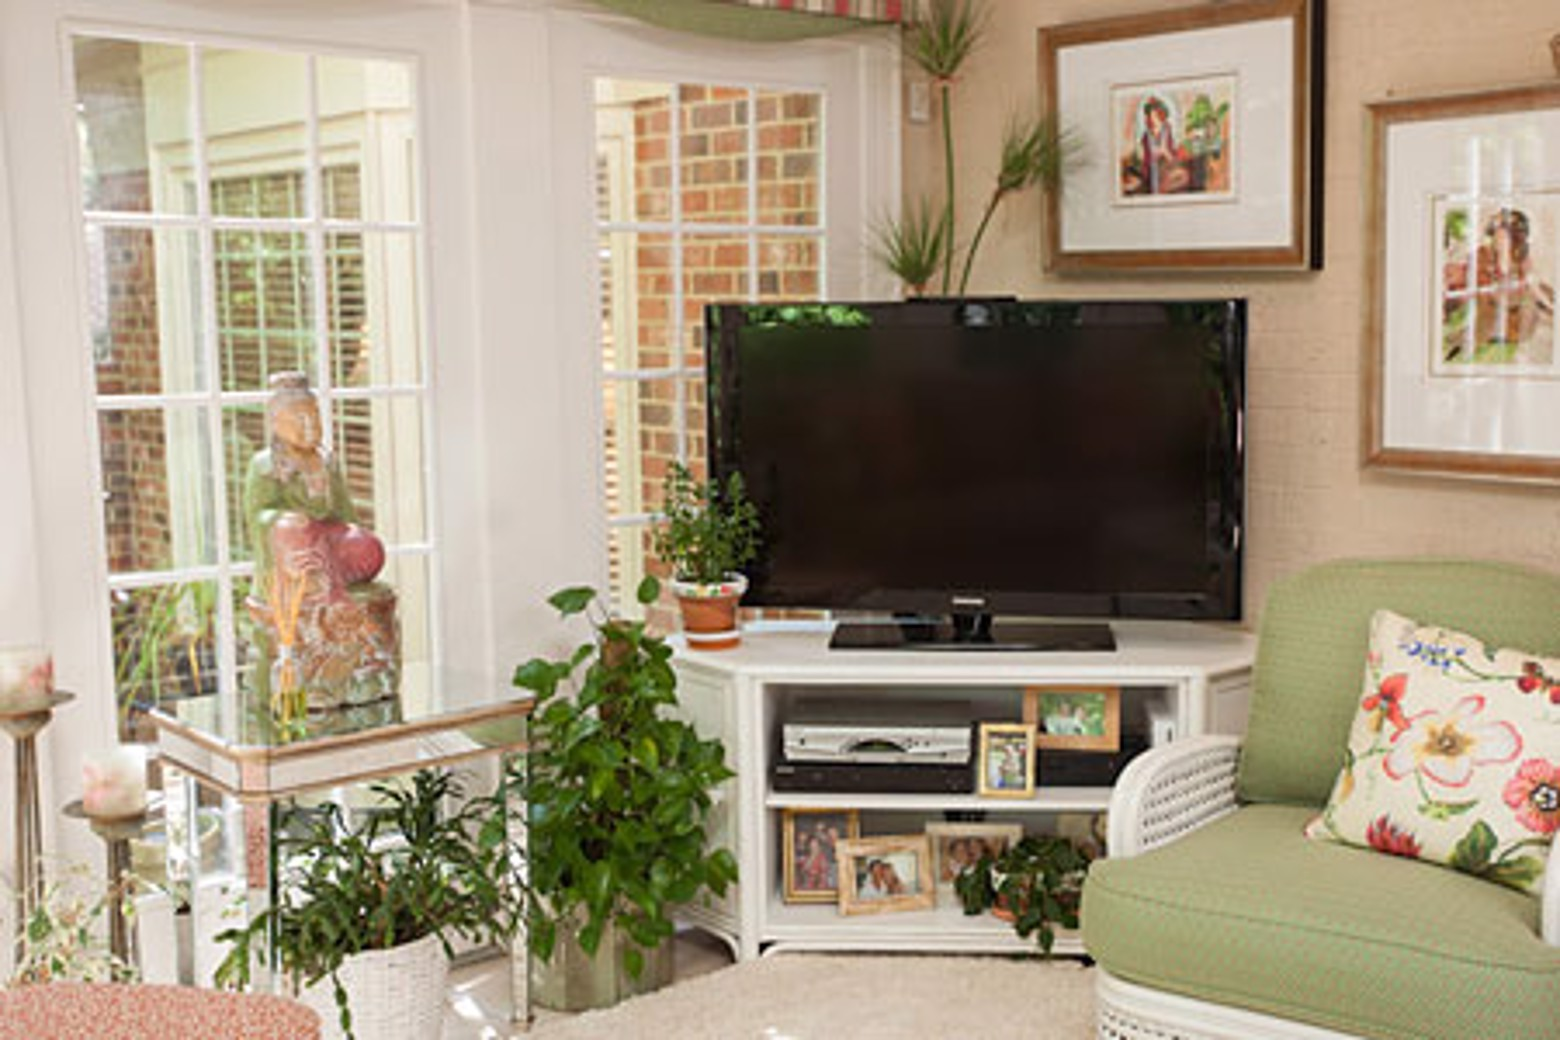 North Carolina Garden Sunroom image